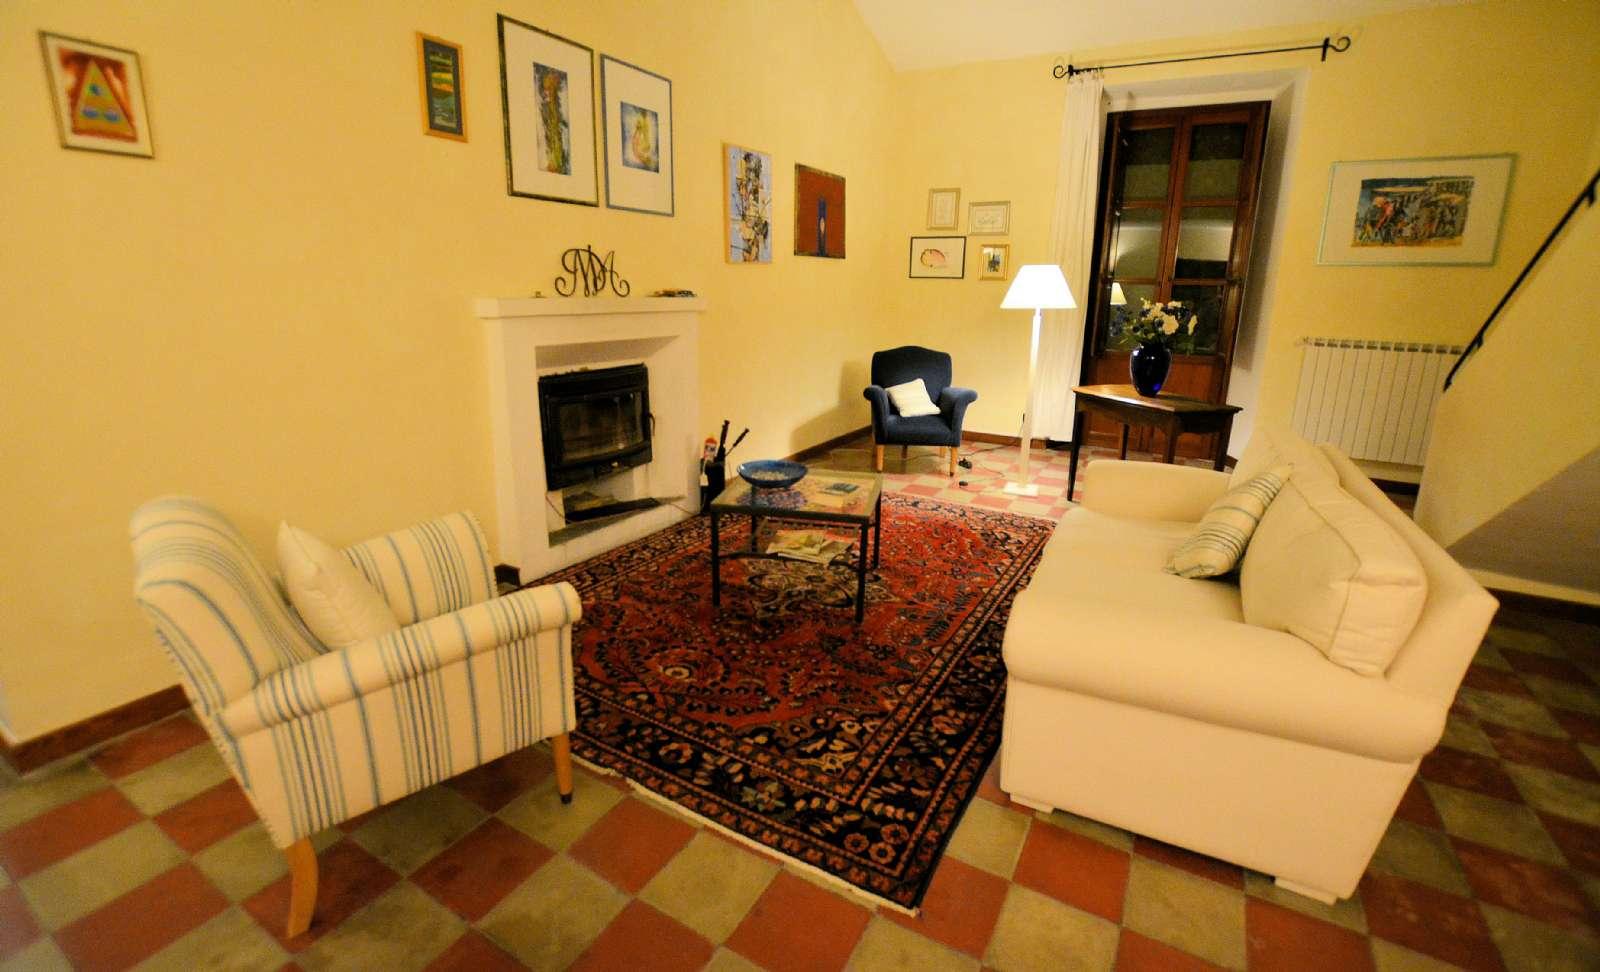 The elegant fireplace lounge